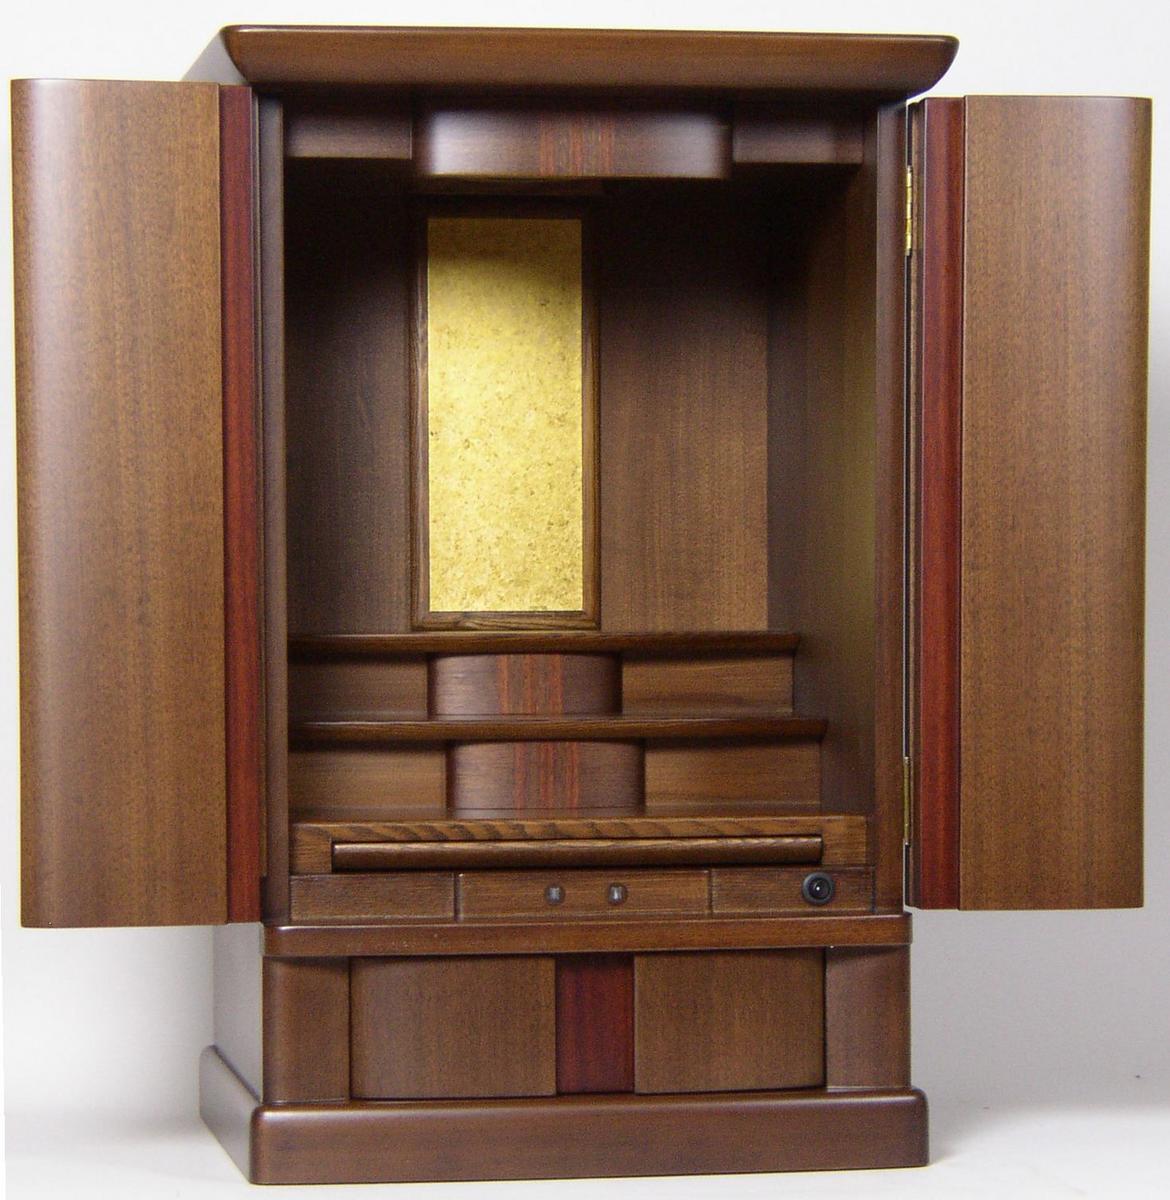 Altar Review Benefits With Zen On Place Modern Buddhist Altars Supplies Rakuten